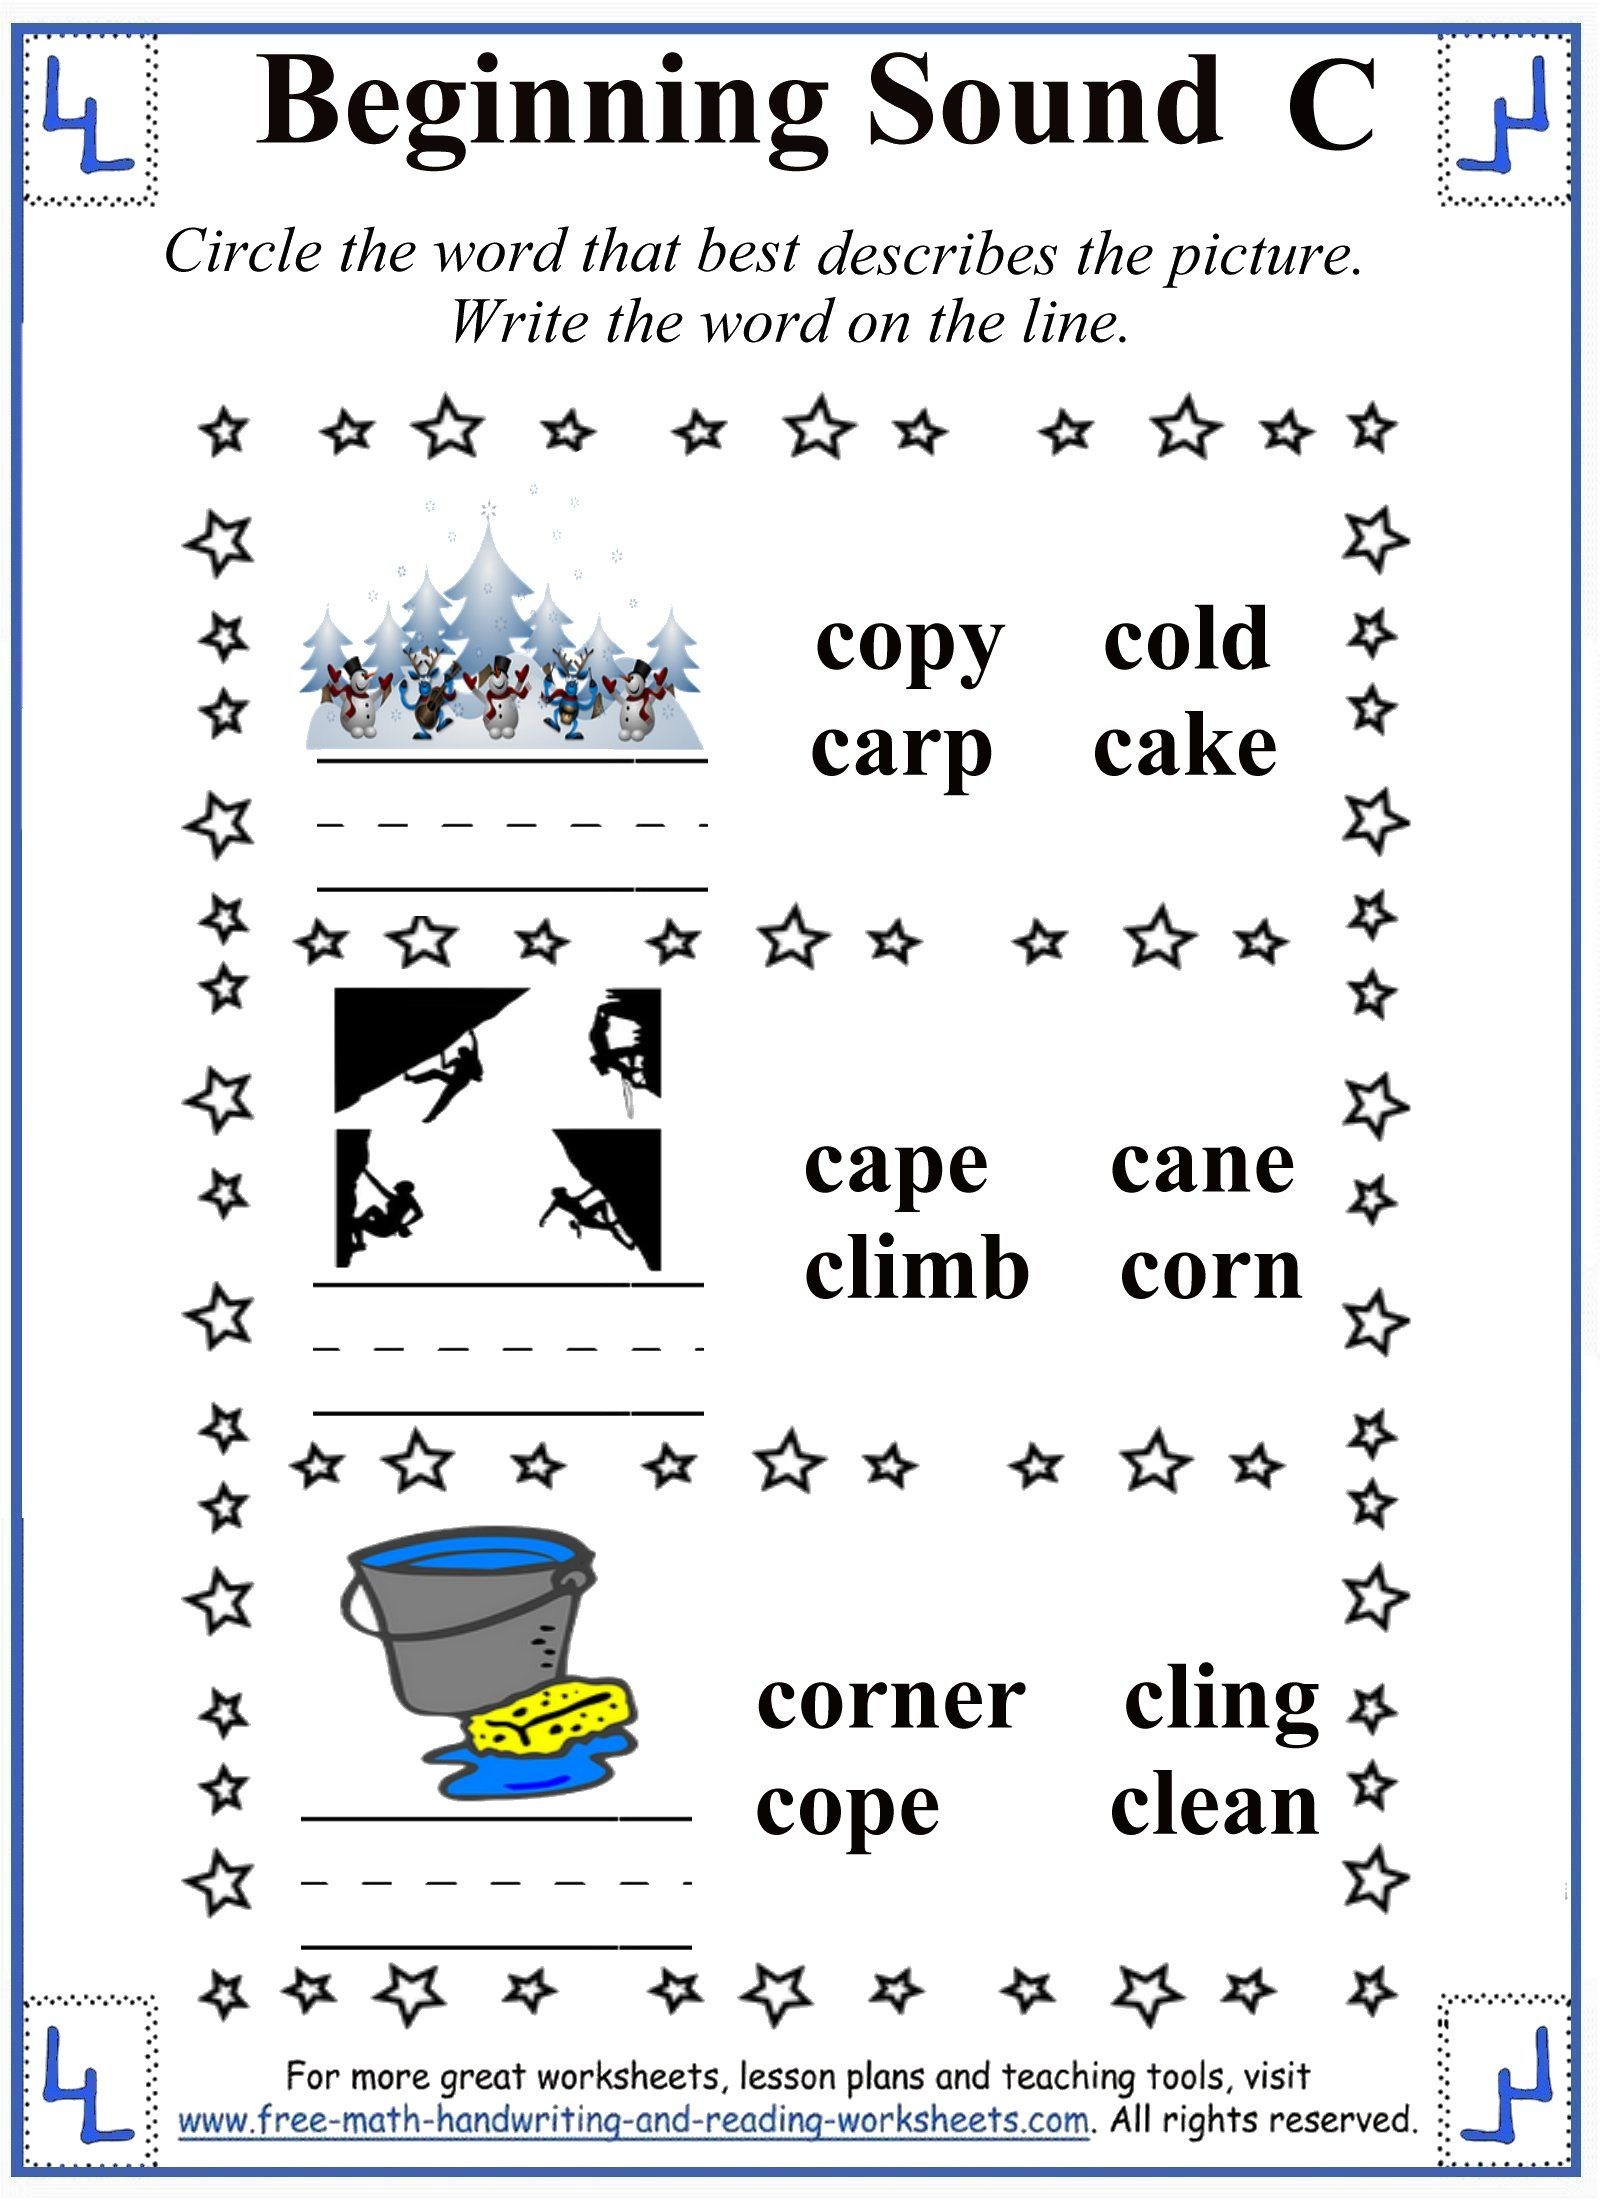 Printable Letter C Worksheets Activities Math Practice Worksheets Math Practices Kids Reading [ 2200 x 1600 Pixel ]